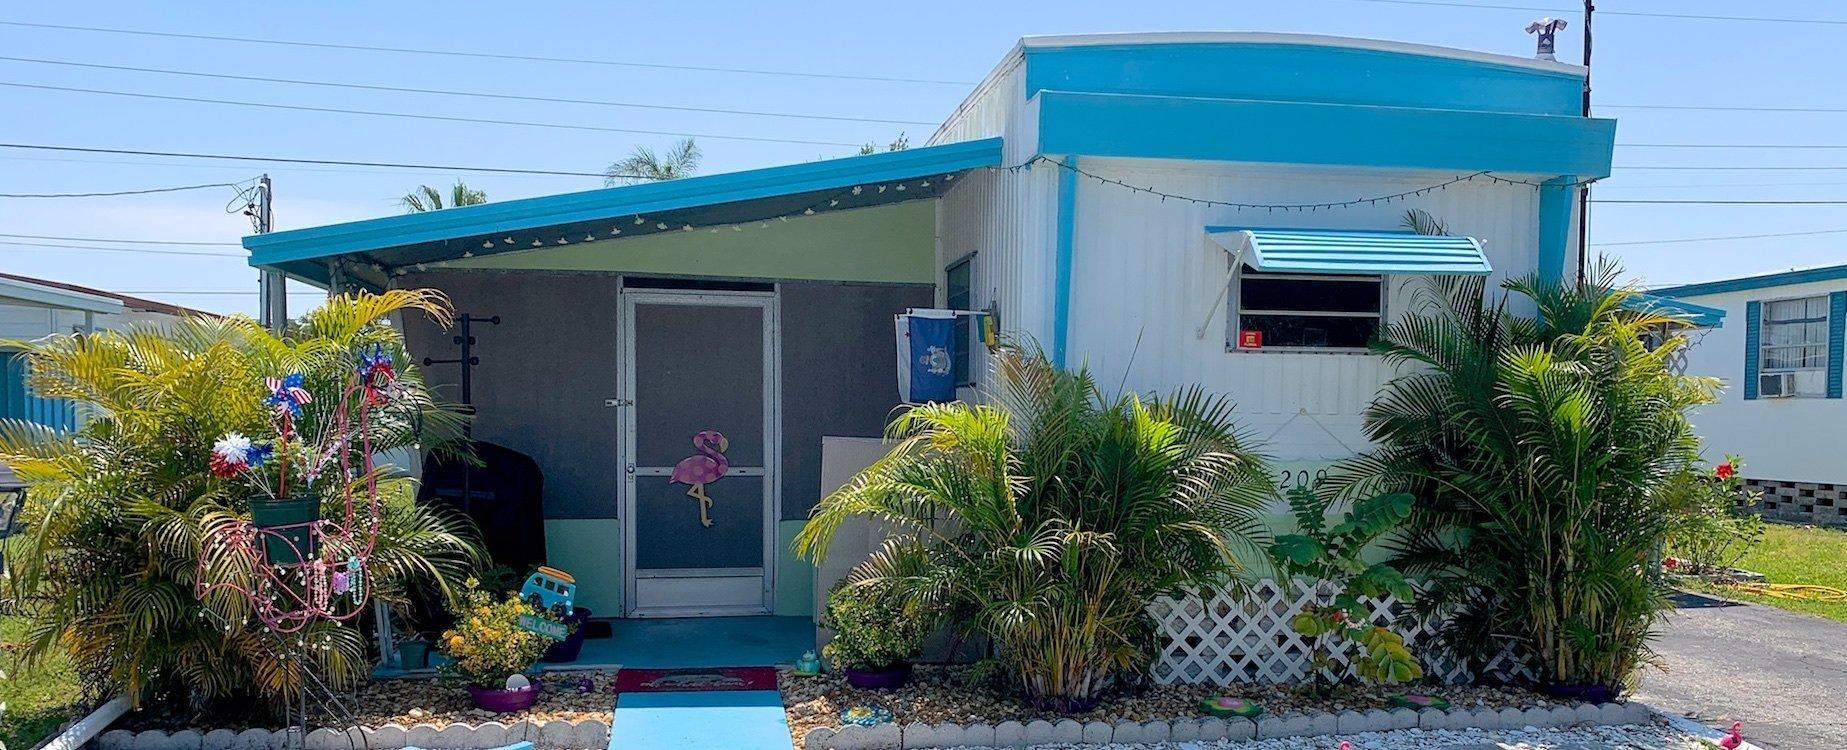 Mobile Home For Sale Clearwater Fl Glen Ellen 209